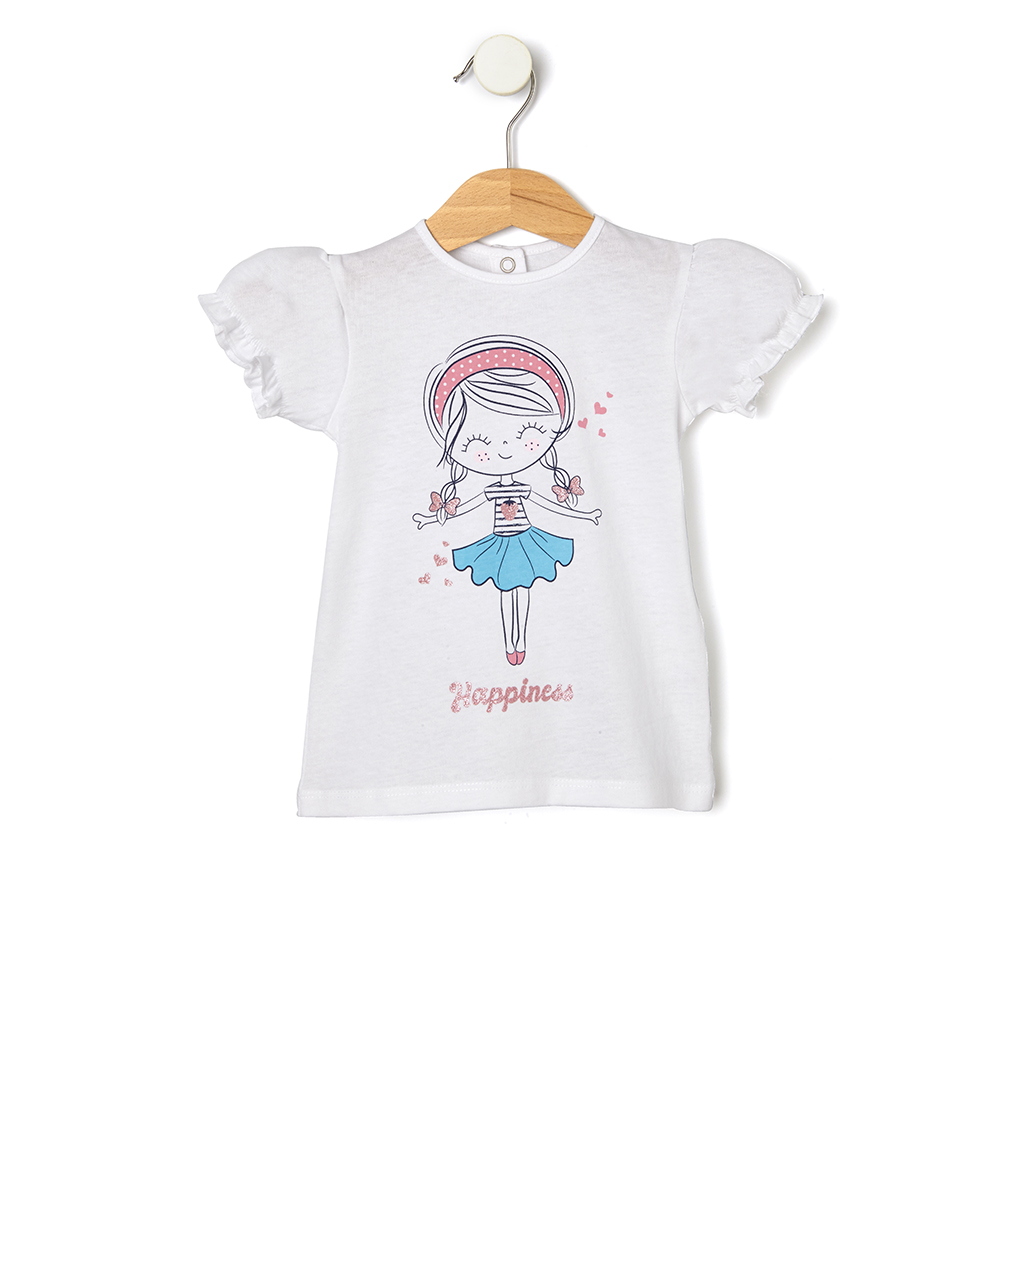 T-Shirt Λευκό με Στάμπα για Κορίτσι